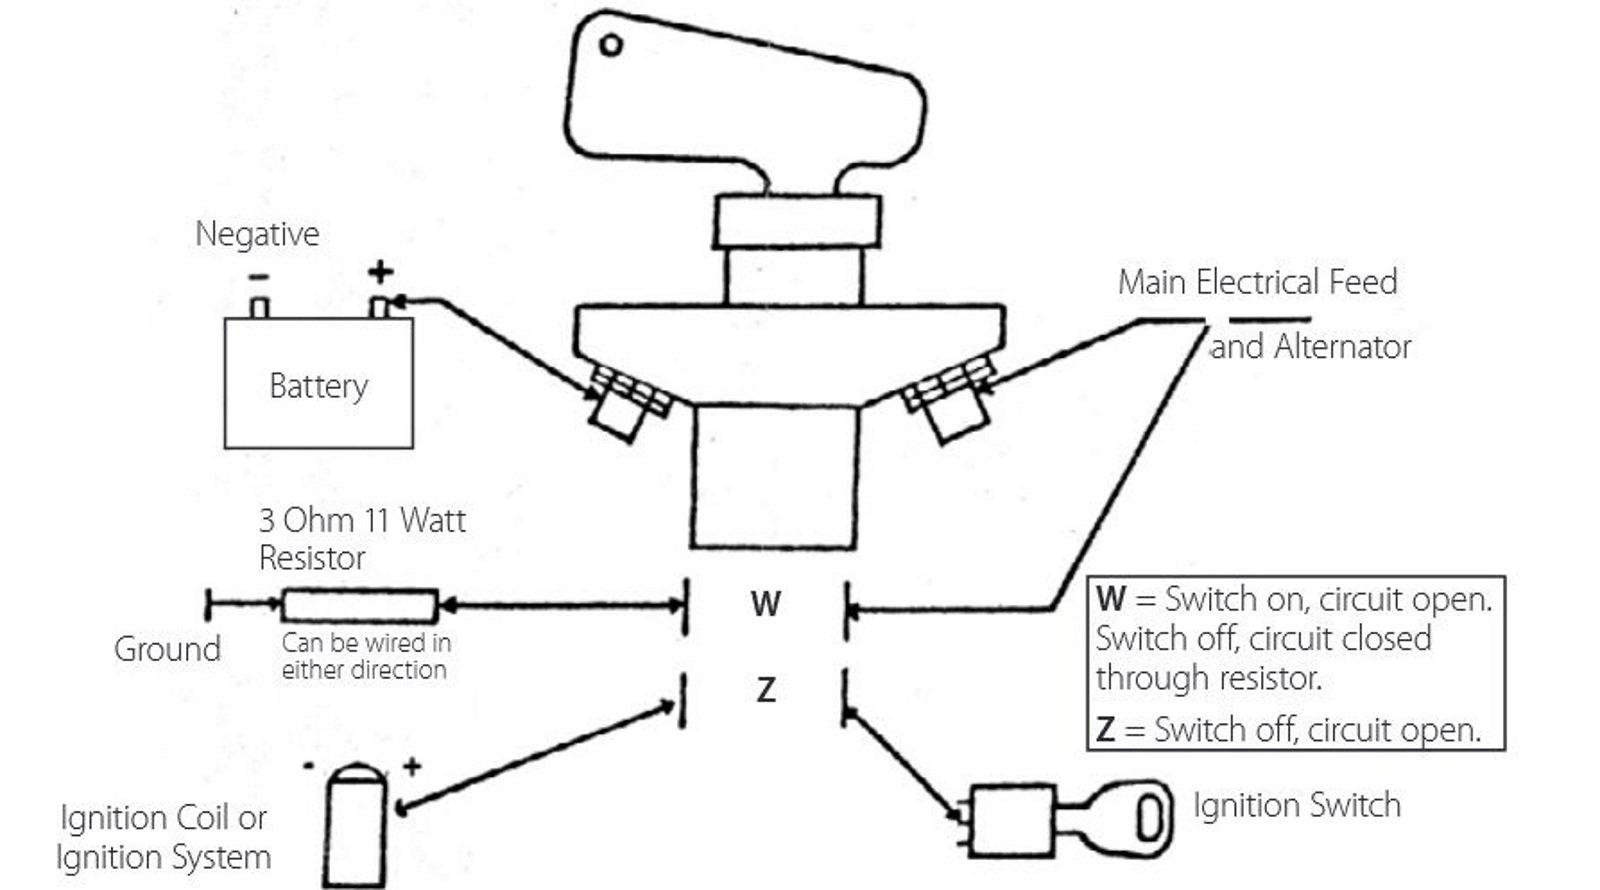 Magneto Kill Switch Wiring Diagram Schematics Small Engine Lawn Mower Ignition